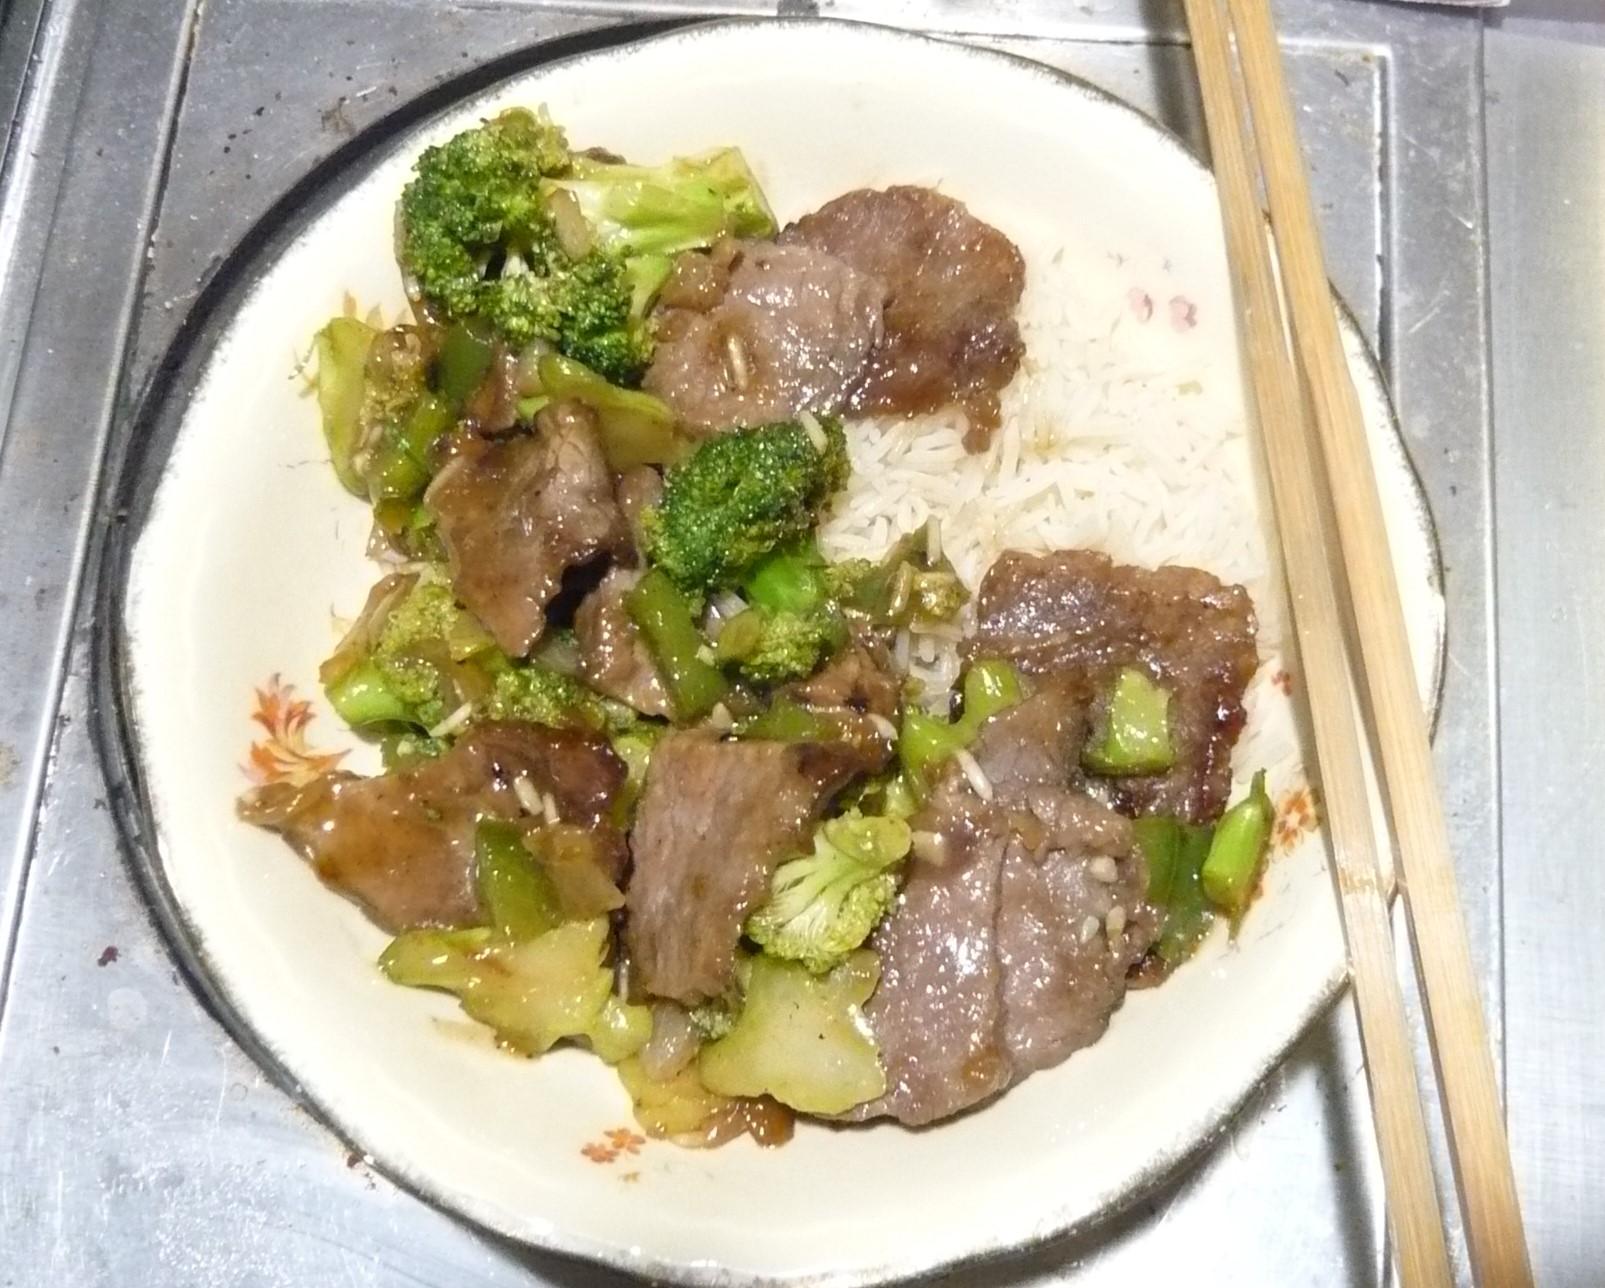 Fun Karnal (Beef and Broccoli) Jan Mowbray